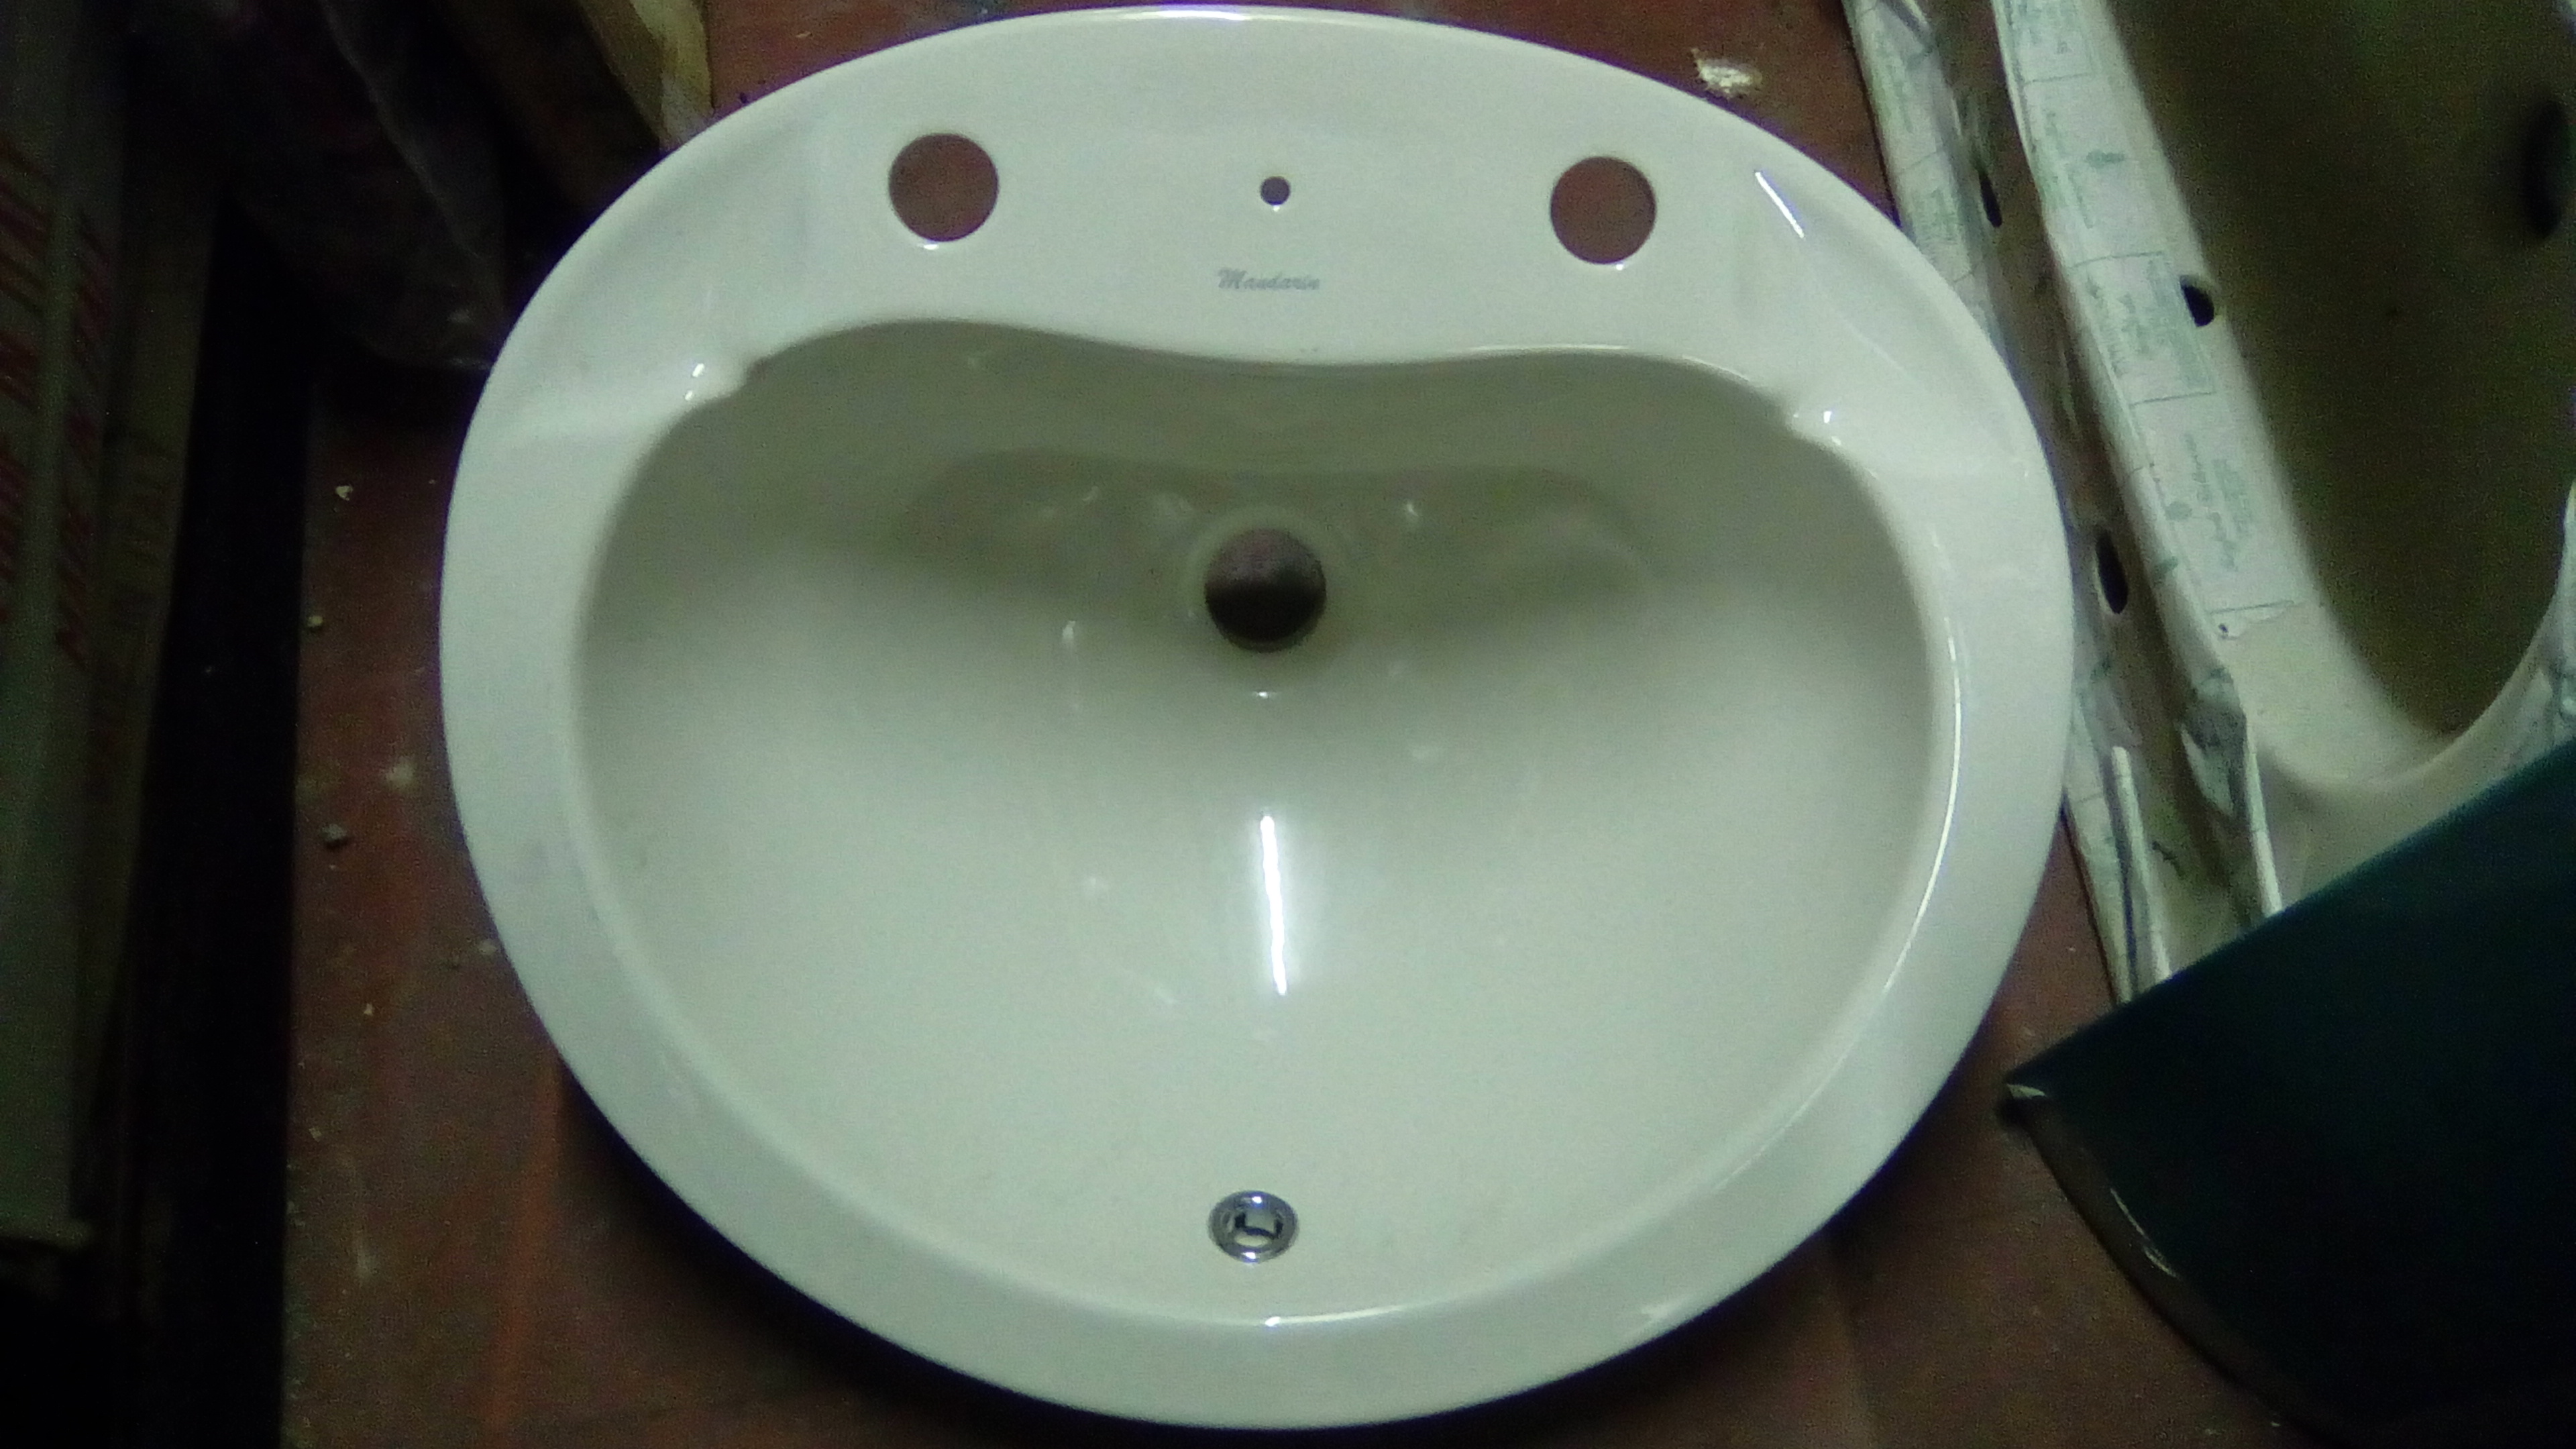 Indian Ivory Baths Panels Toilets Seats Basins Jsl Bathrooms Bradford Yorkshire